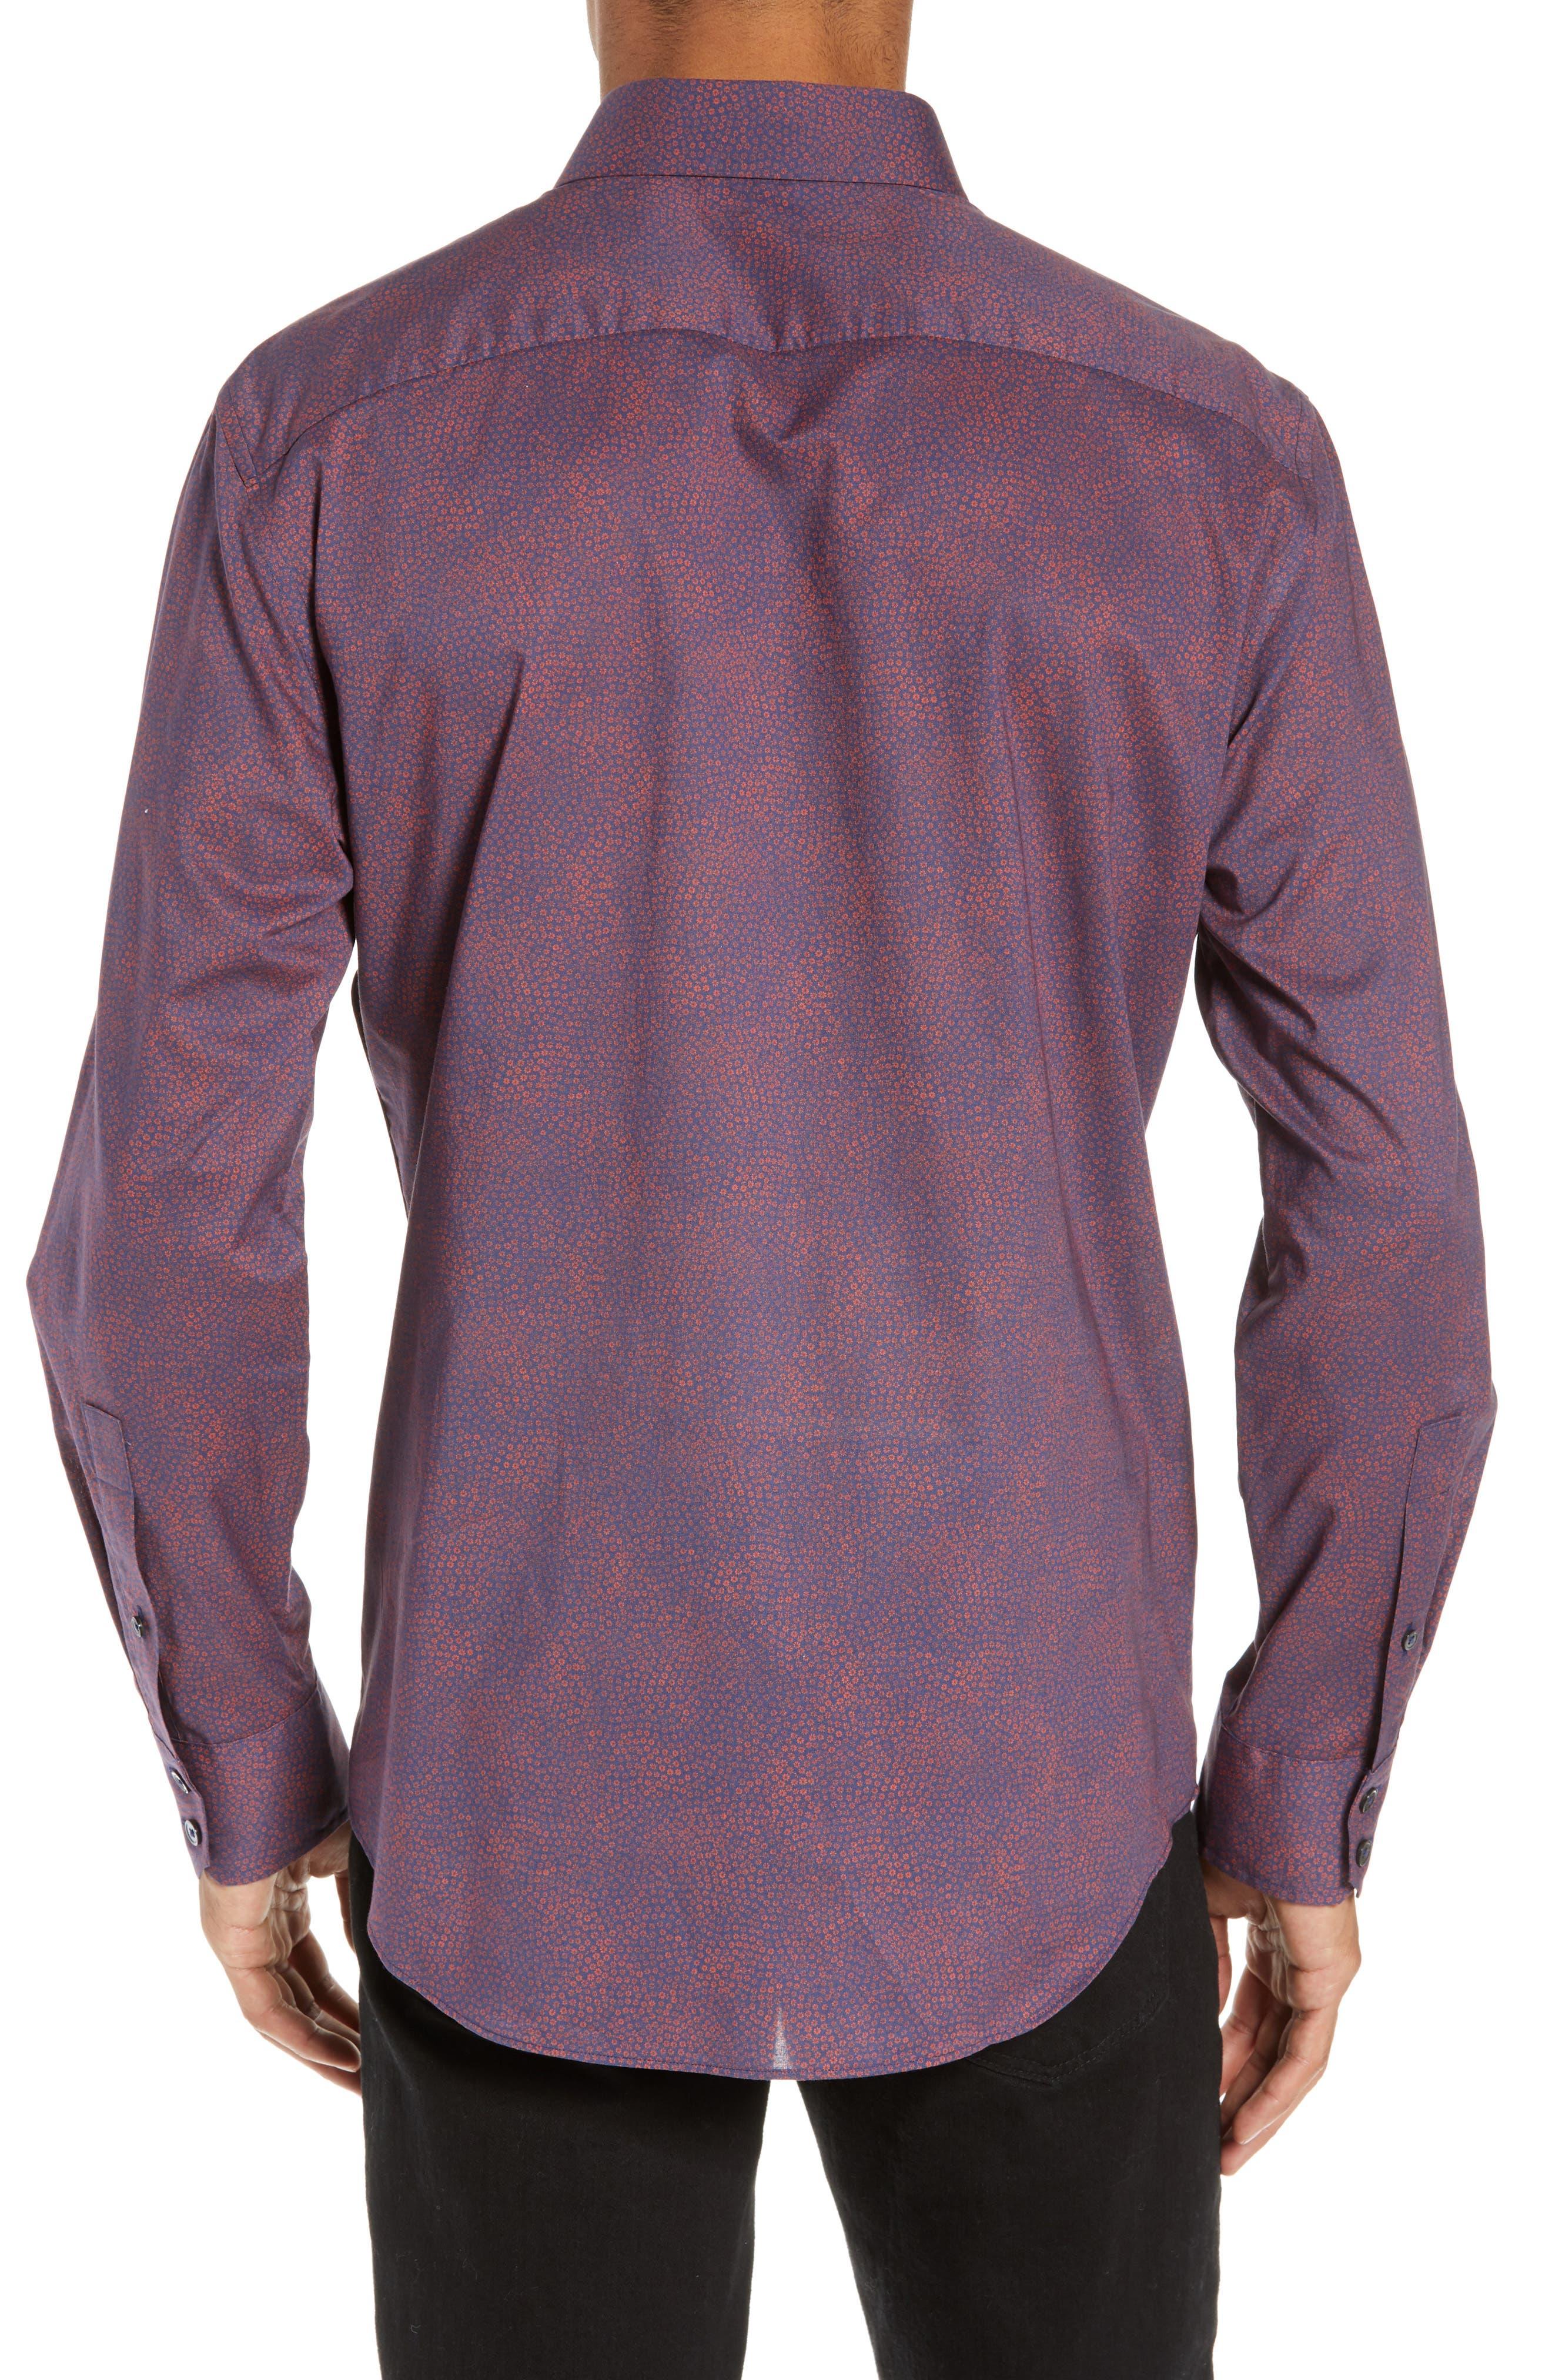 ZACHARY PRELL, Maryna Regular Fit Floral Print Sport Shirt, Alternate thumbnail 3, color, ORANGE